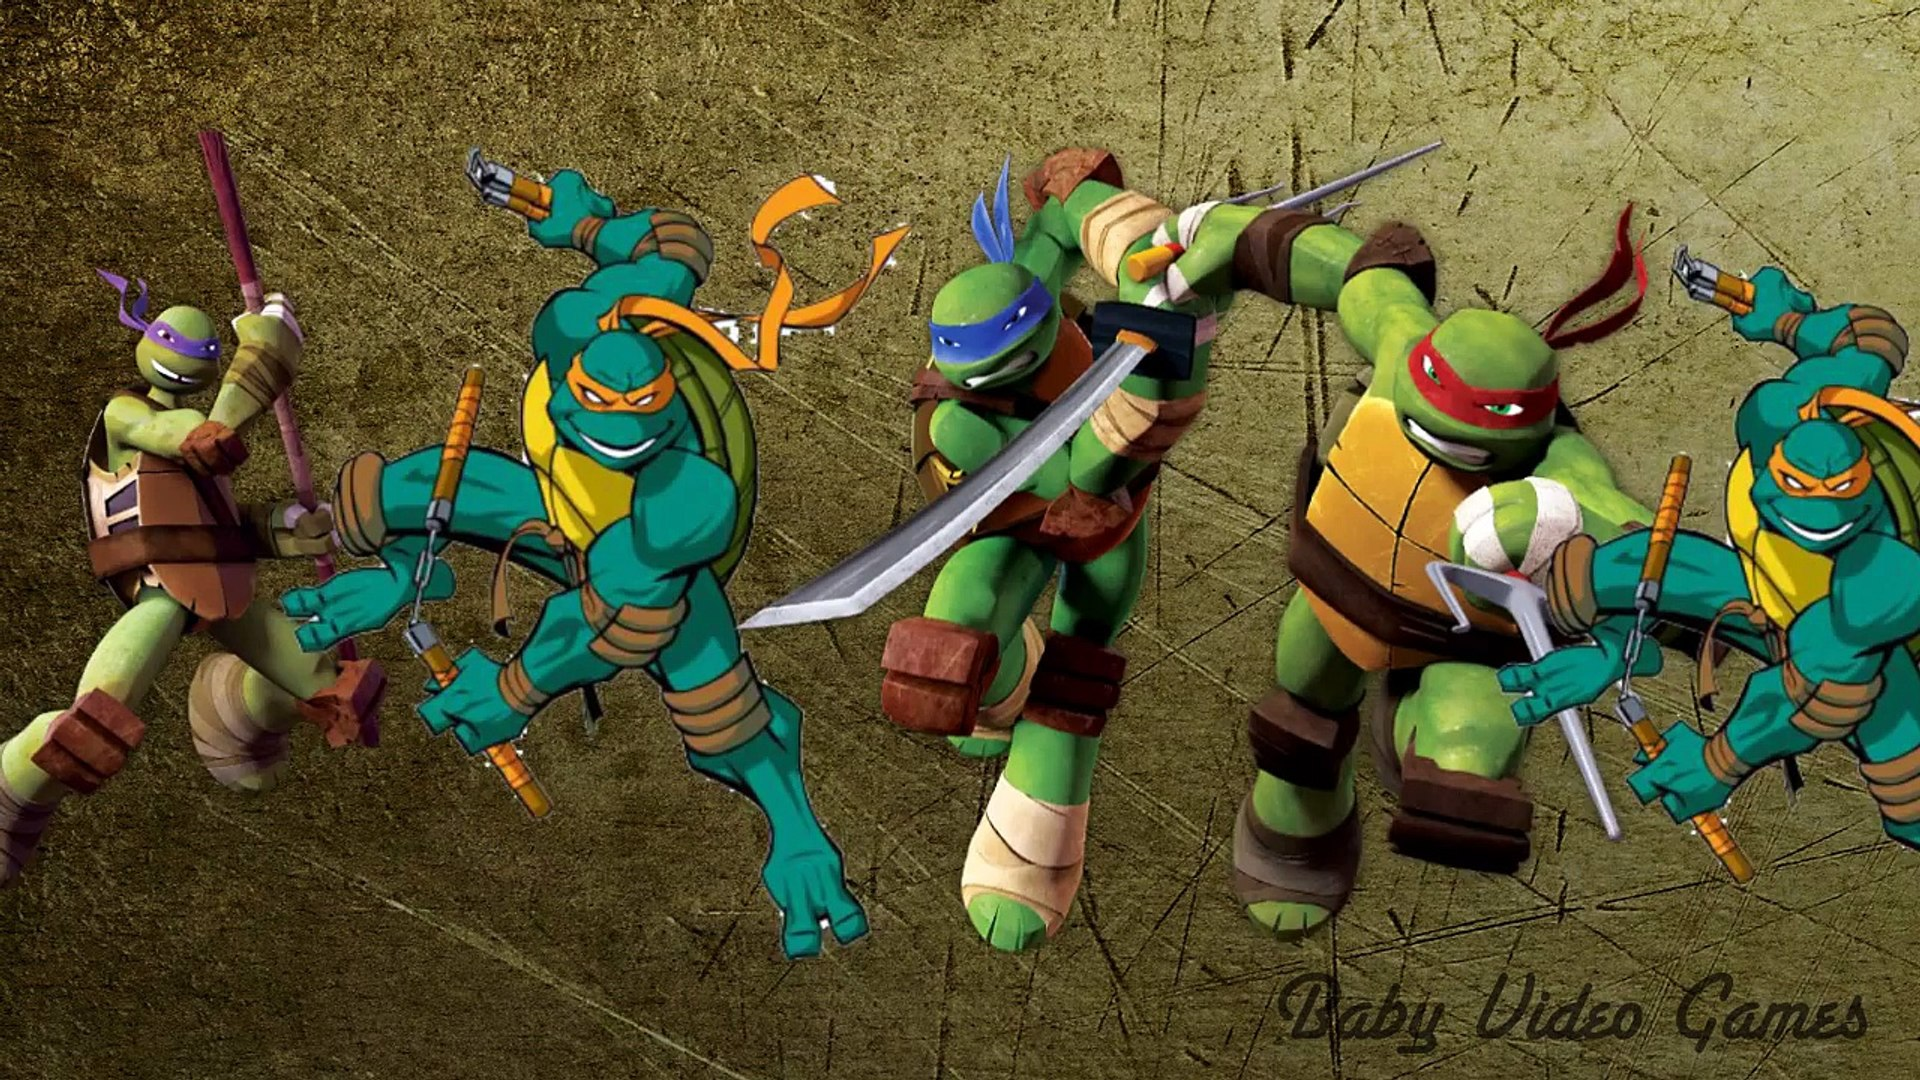 Ninja Turtles Daddy Finger Family Kids Music Video